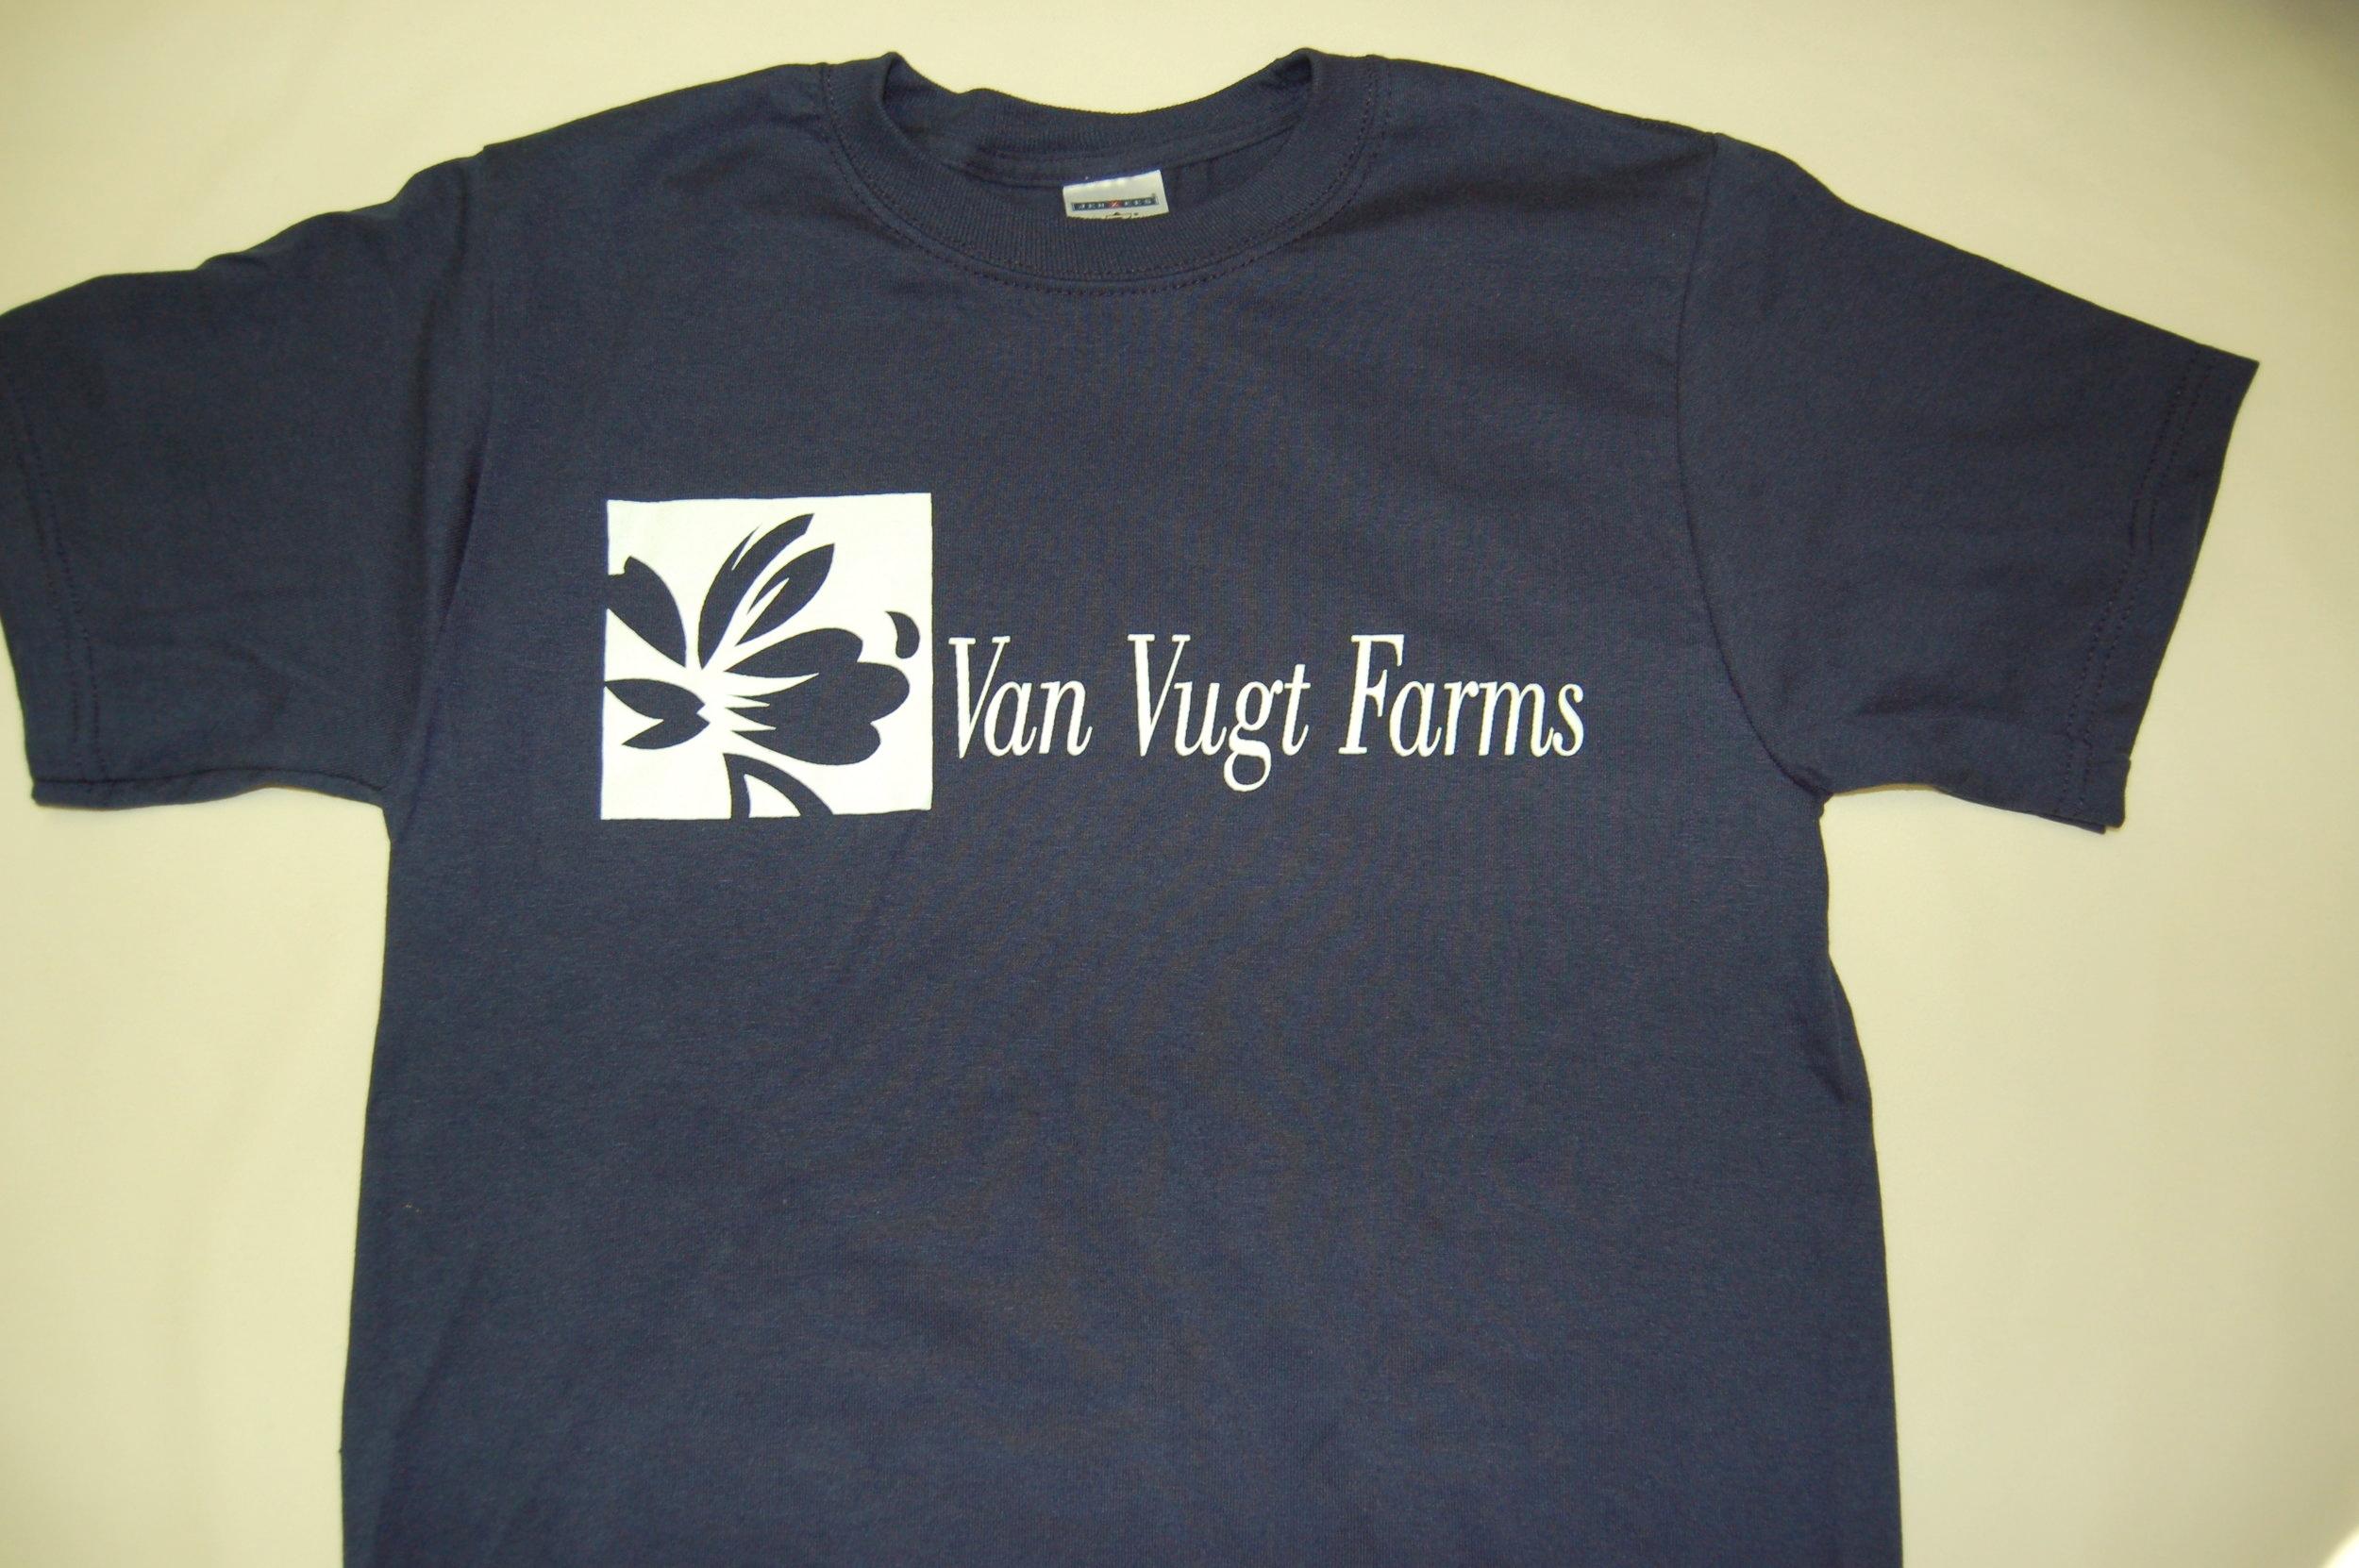 Van Vugt Farms navy front.JPG